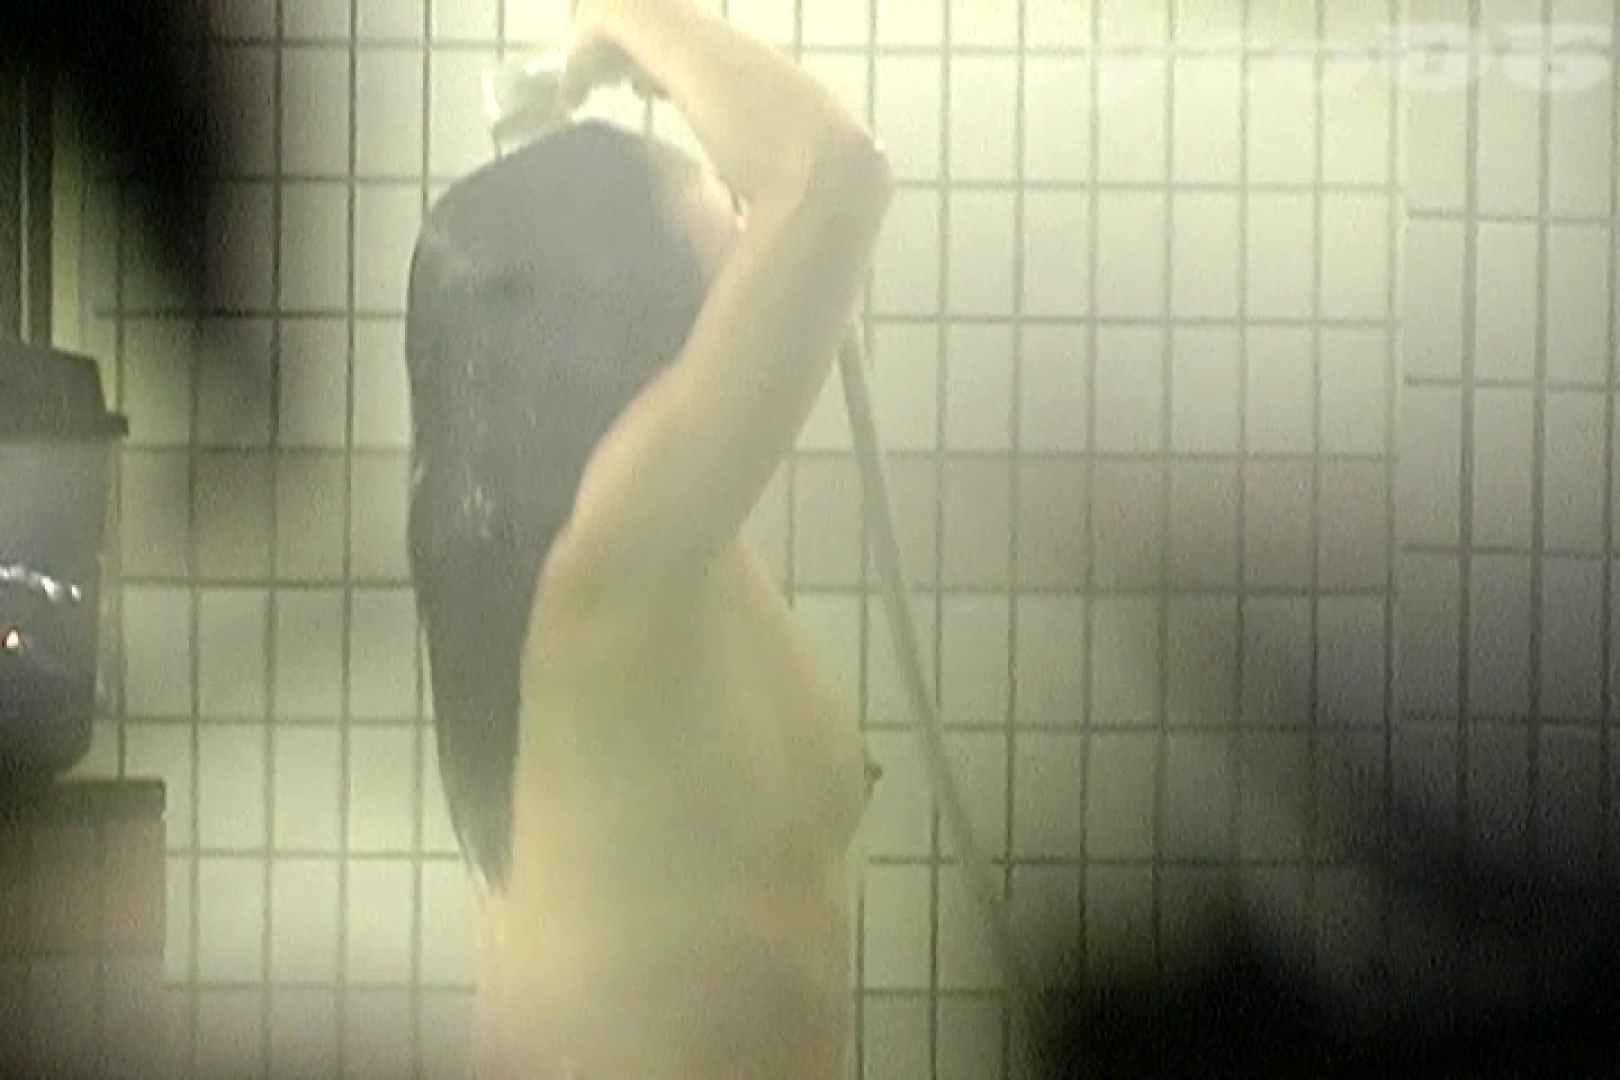 ▲復活限定▲合宿ホテル女風呂盗撮 Vol.36 期間限定 エロ無料画像 70pic 3